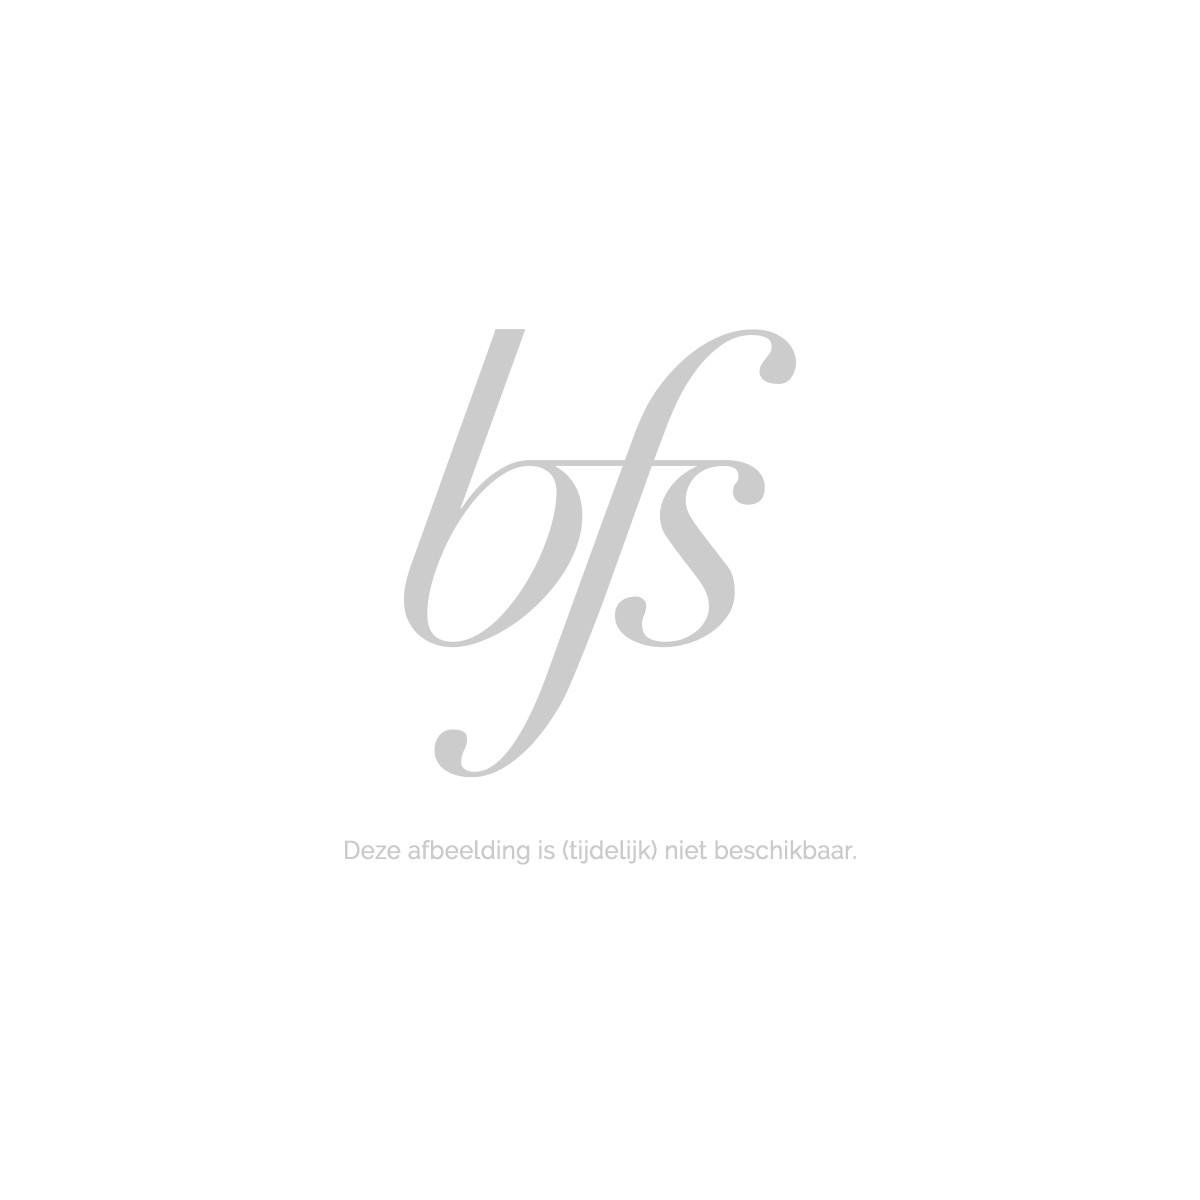 Christian Dior Diorshow Waterproof Buildable Vol. Mascara 11,50 Ml